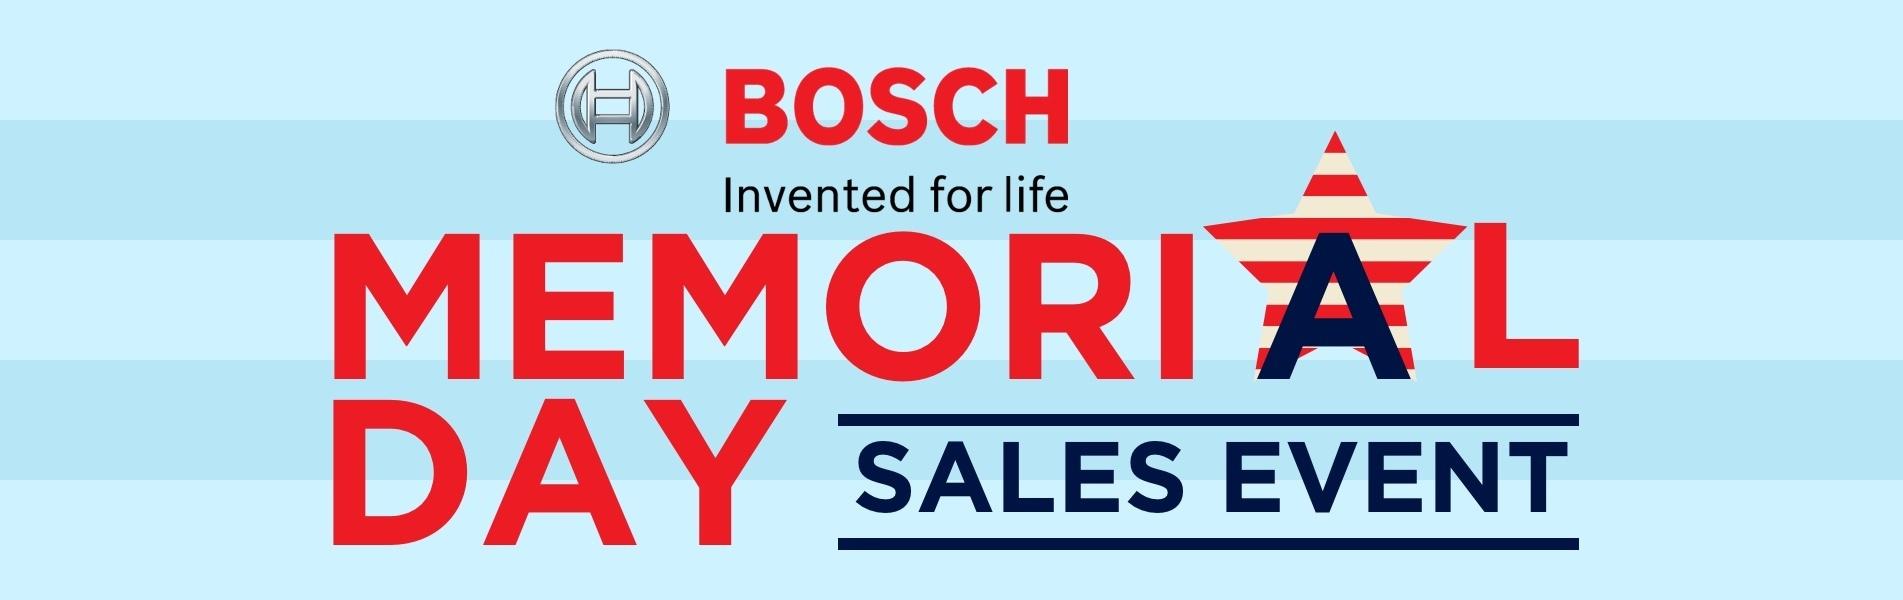 Bosch-Memorial-Day-2021